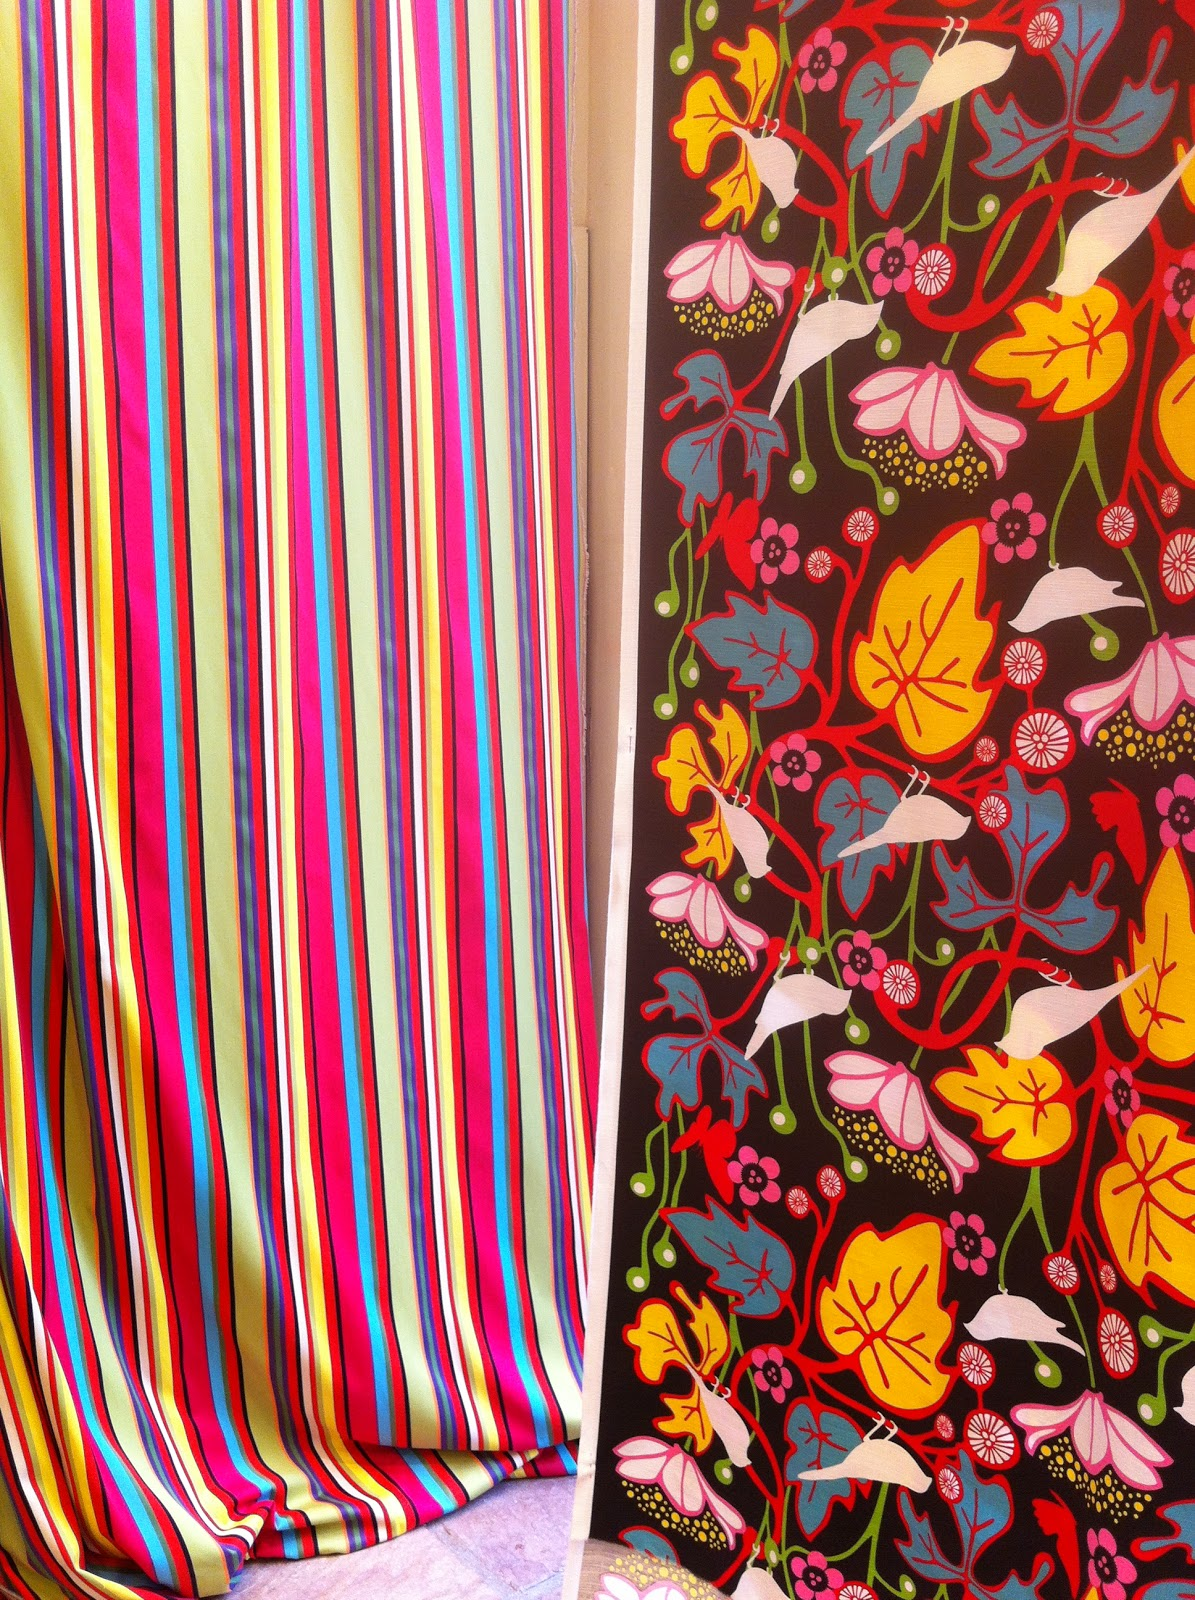 Tendencia en telas de tapicer a deco marce - Telas de tapicerias para sofas ...